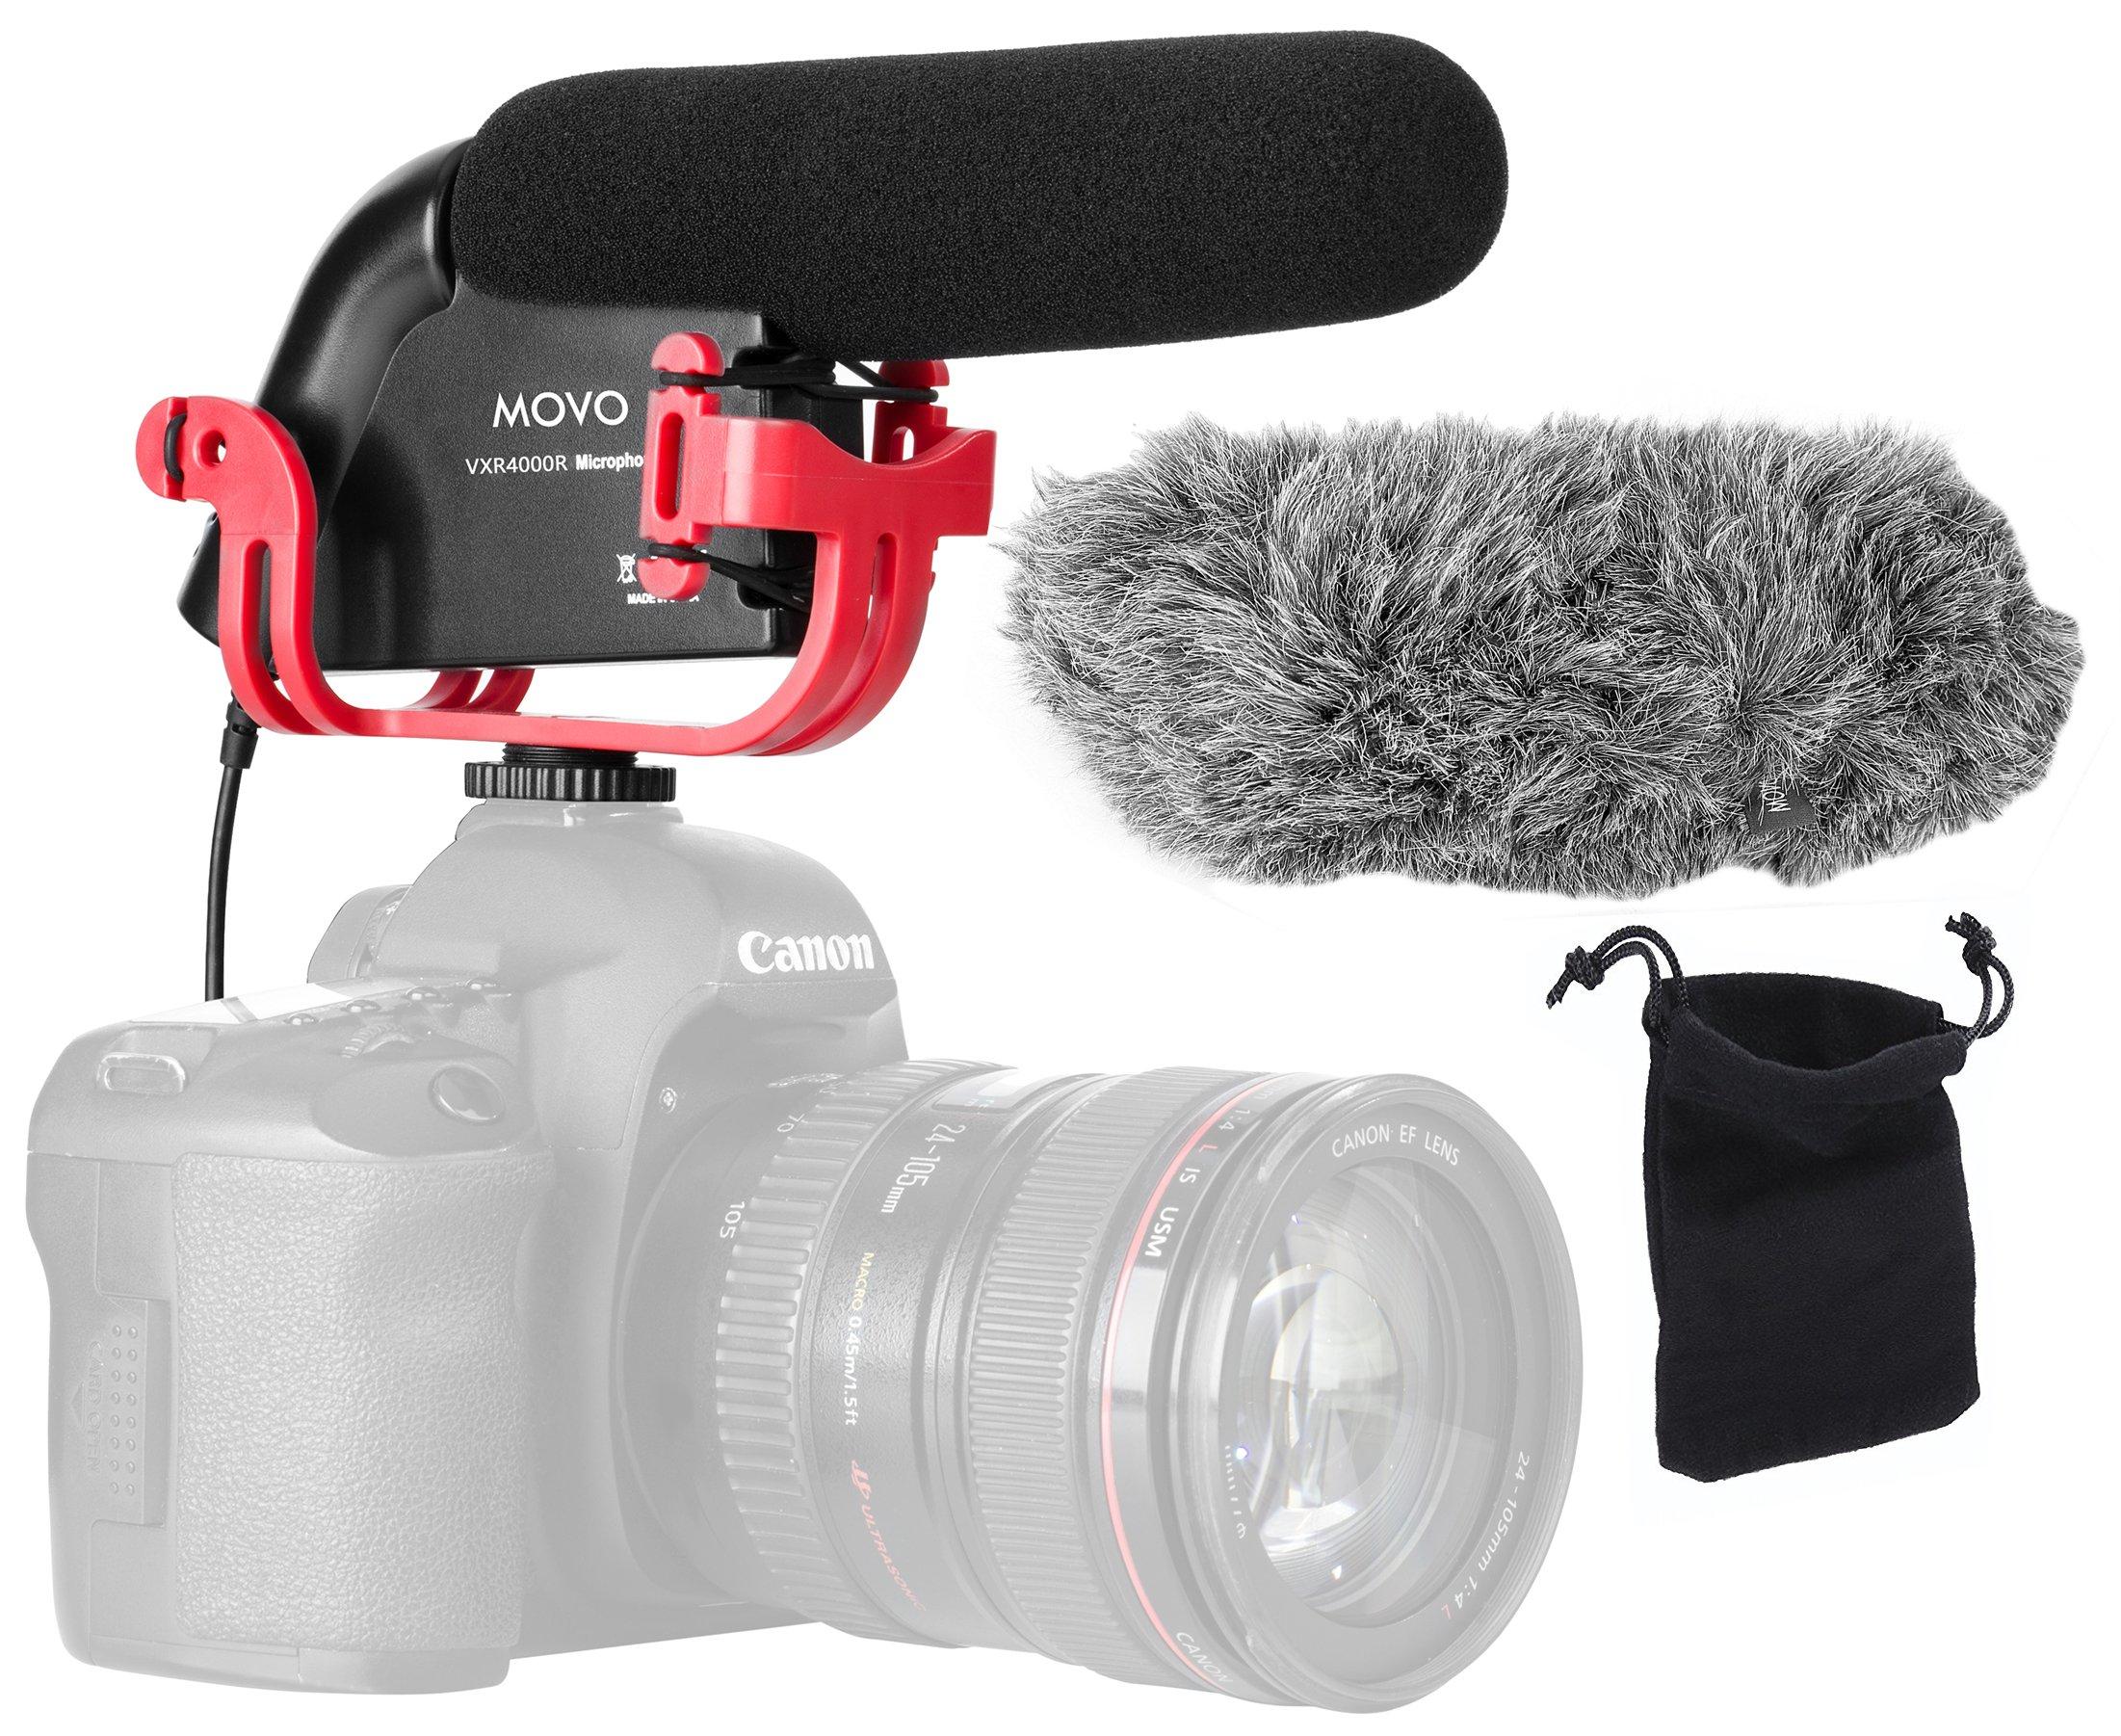 Movo VXR4000R - Micrófono de video de condensador de esco...